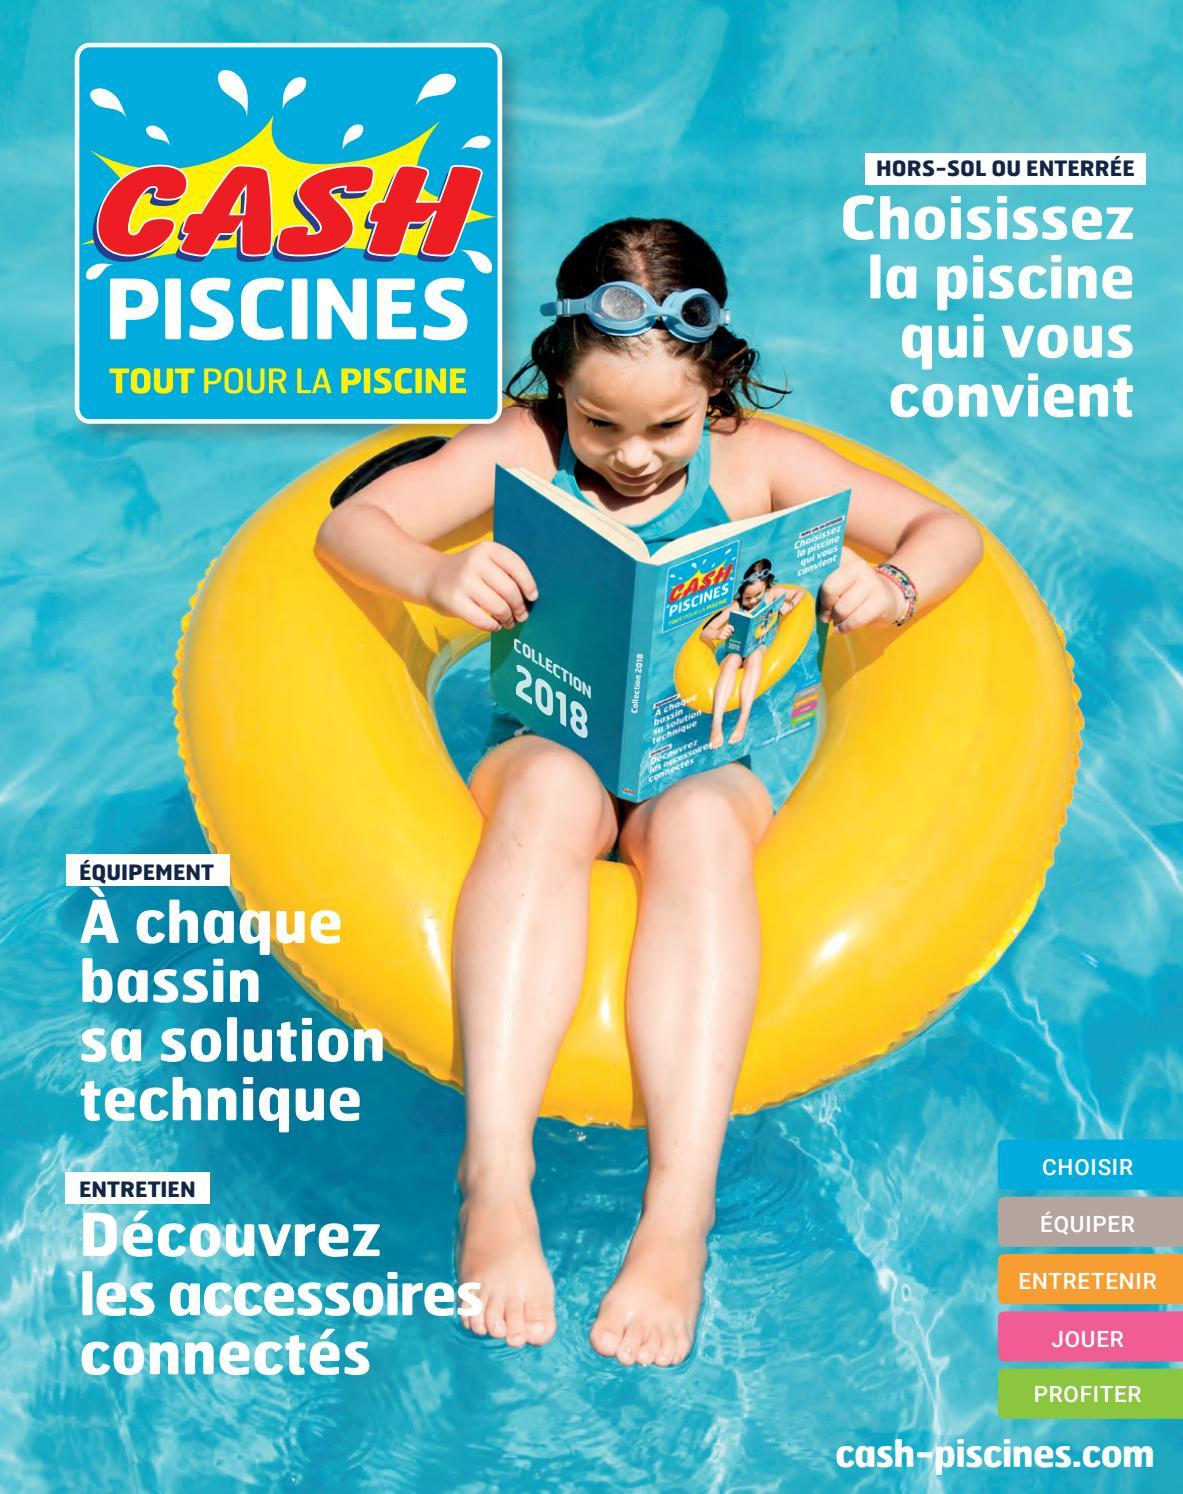 Catalogue Cash Piscine 2018 By Octave Octave - Issuu avec Cash Piscine Nimes